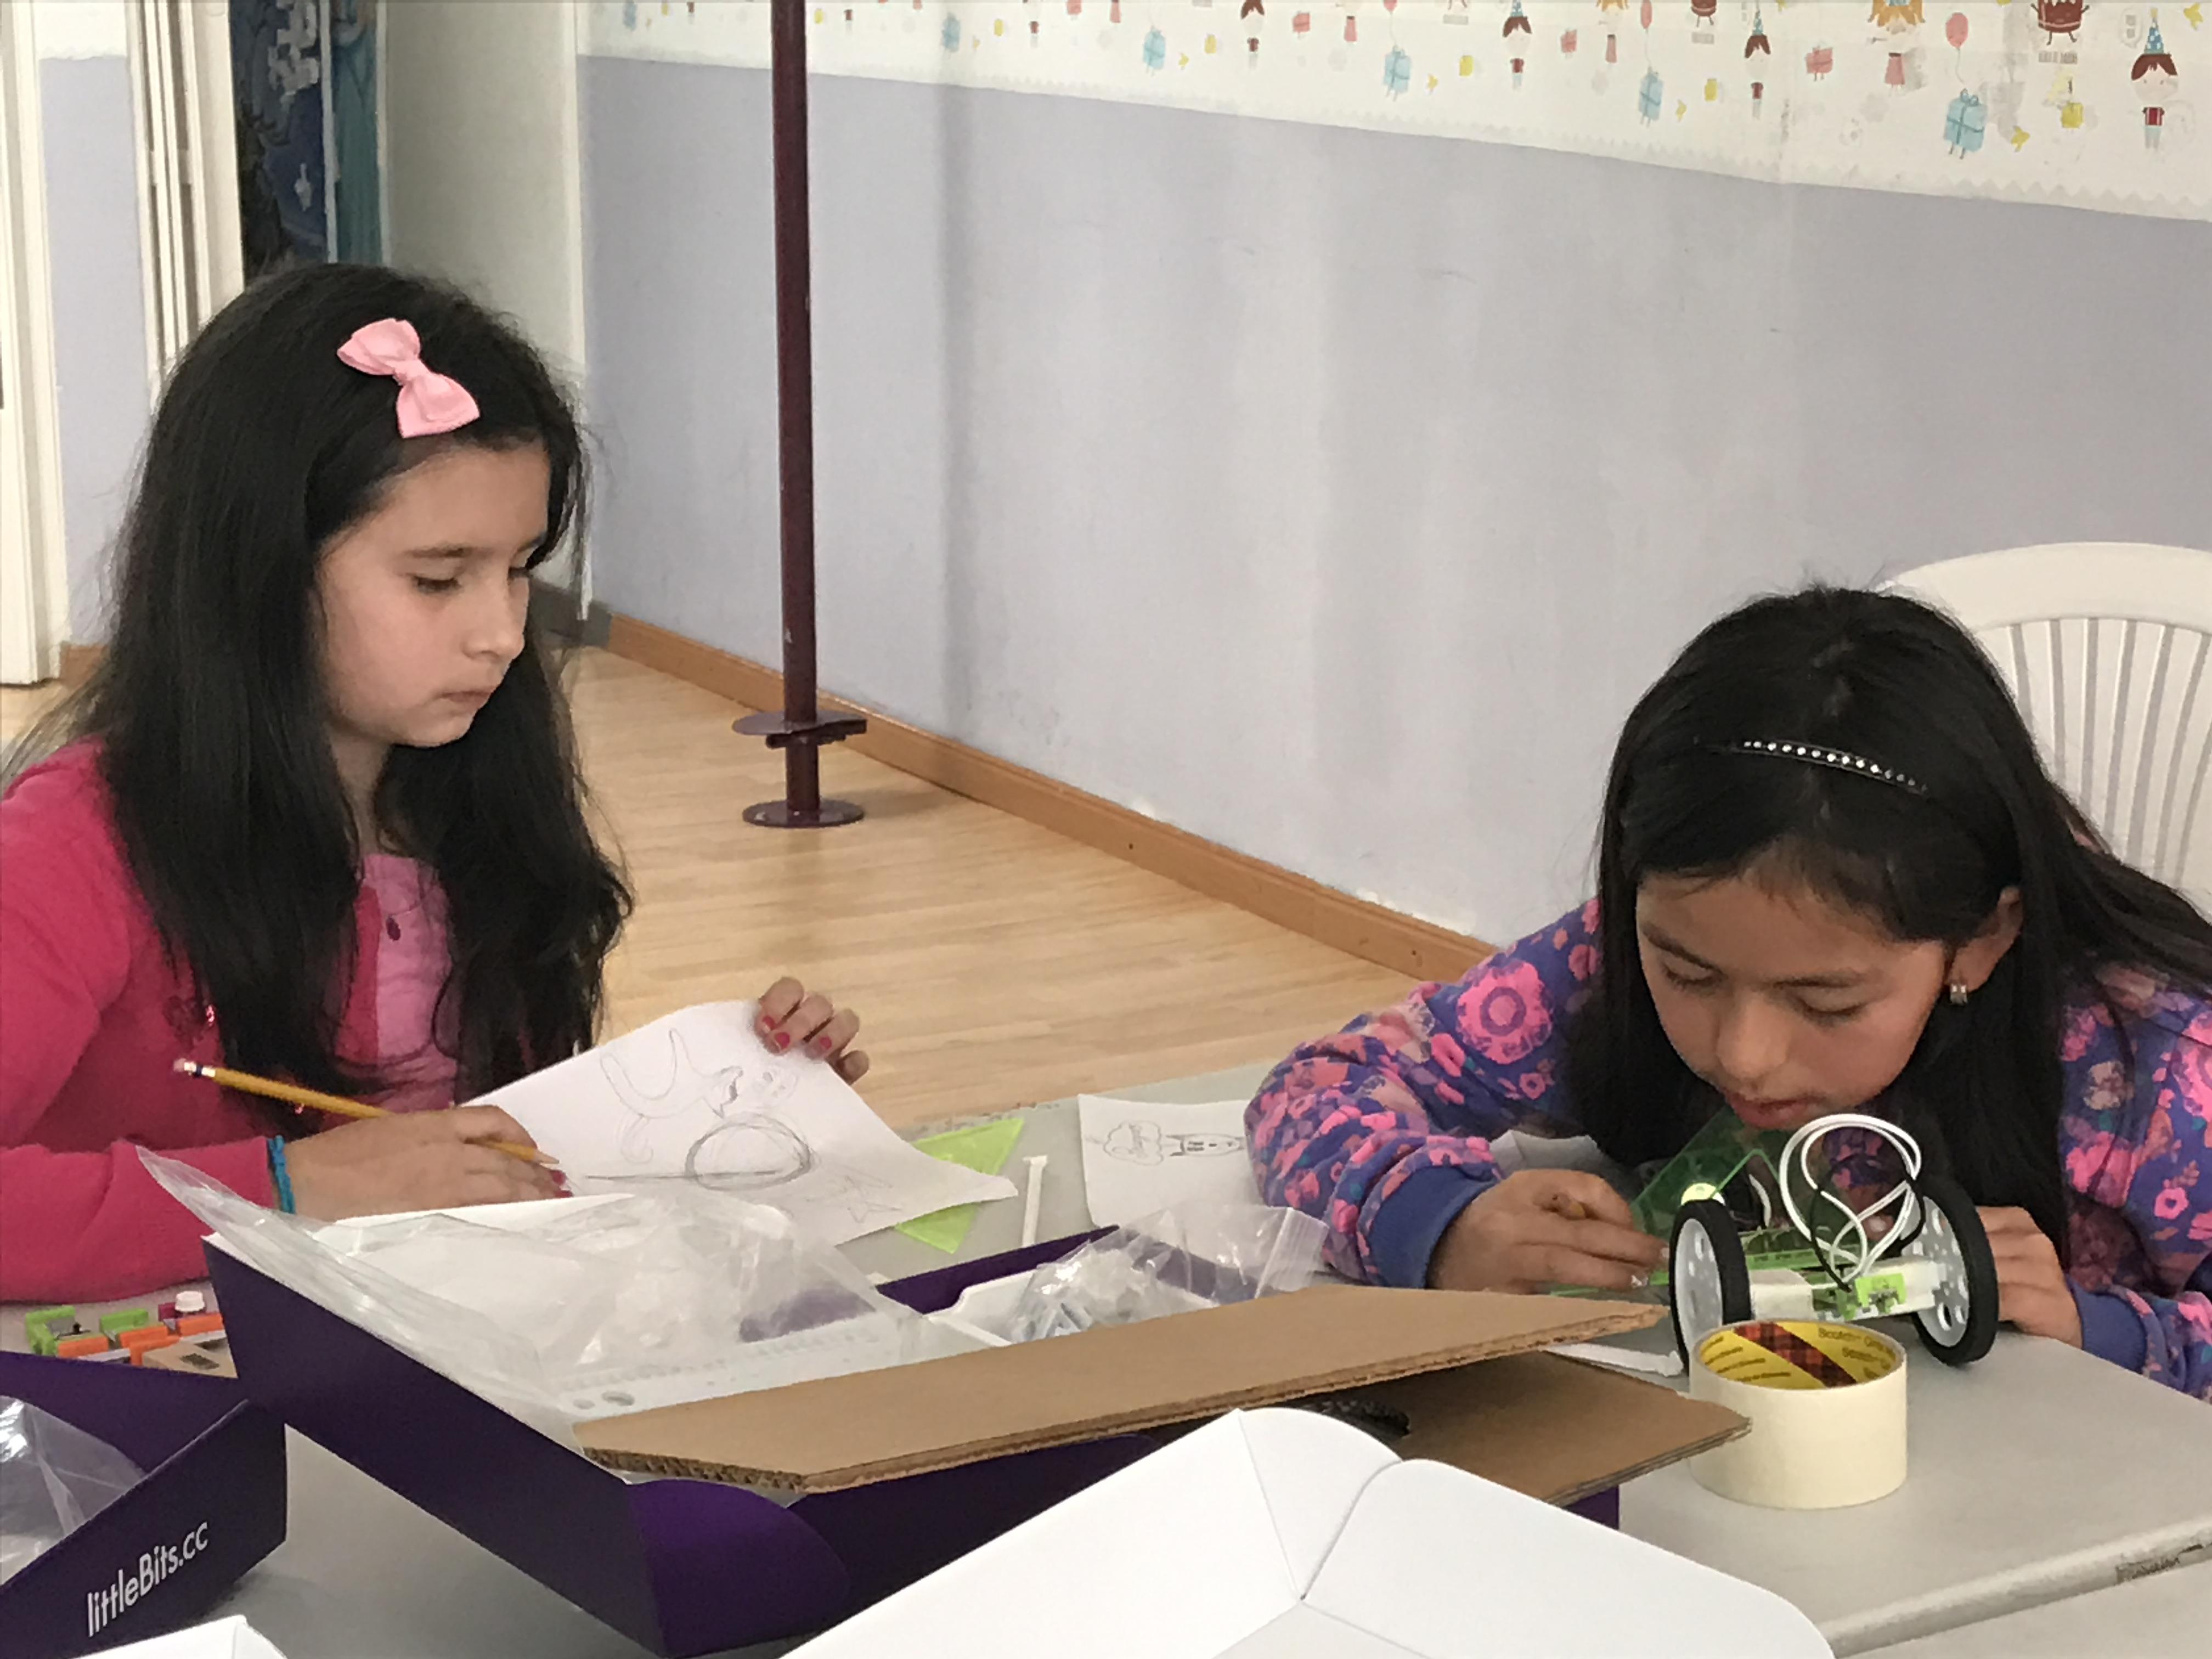 Planeando litlleBits